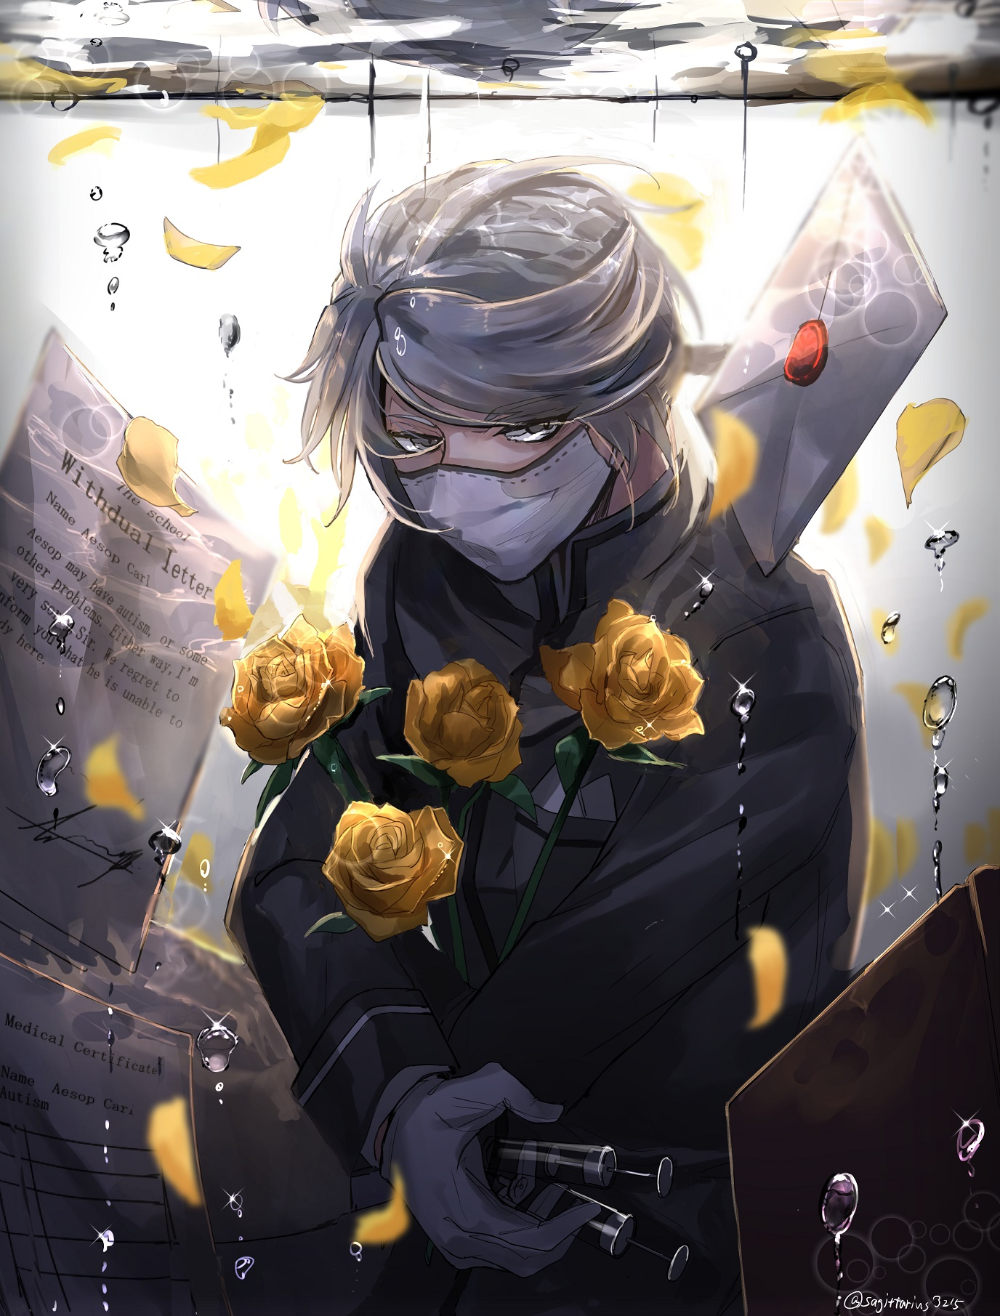 Wallpaper Aesop Carl Anime Yellow Identity Art Anime Identity